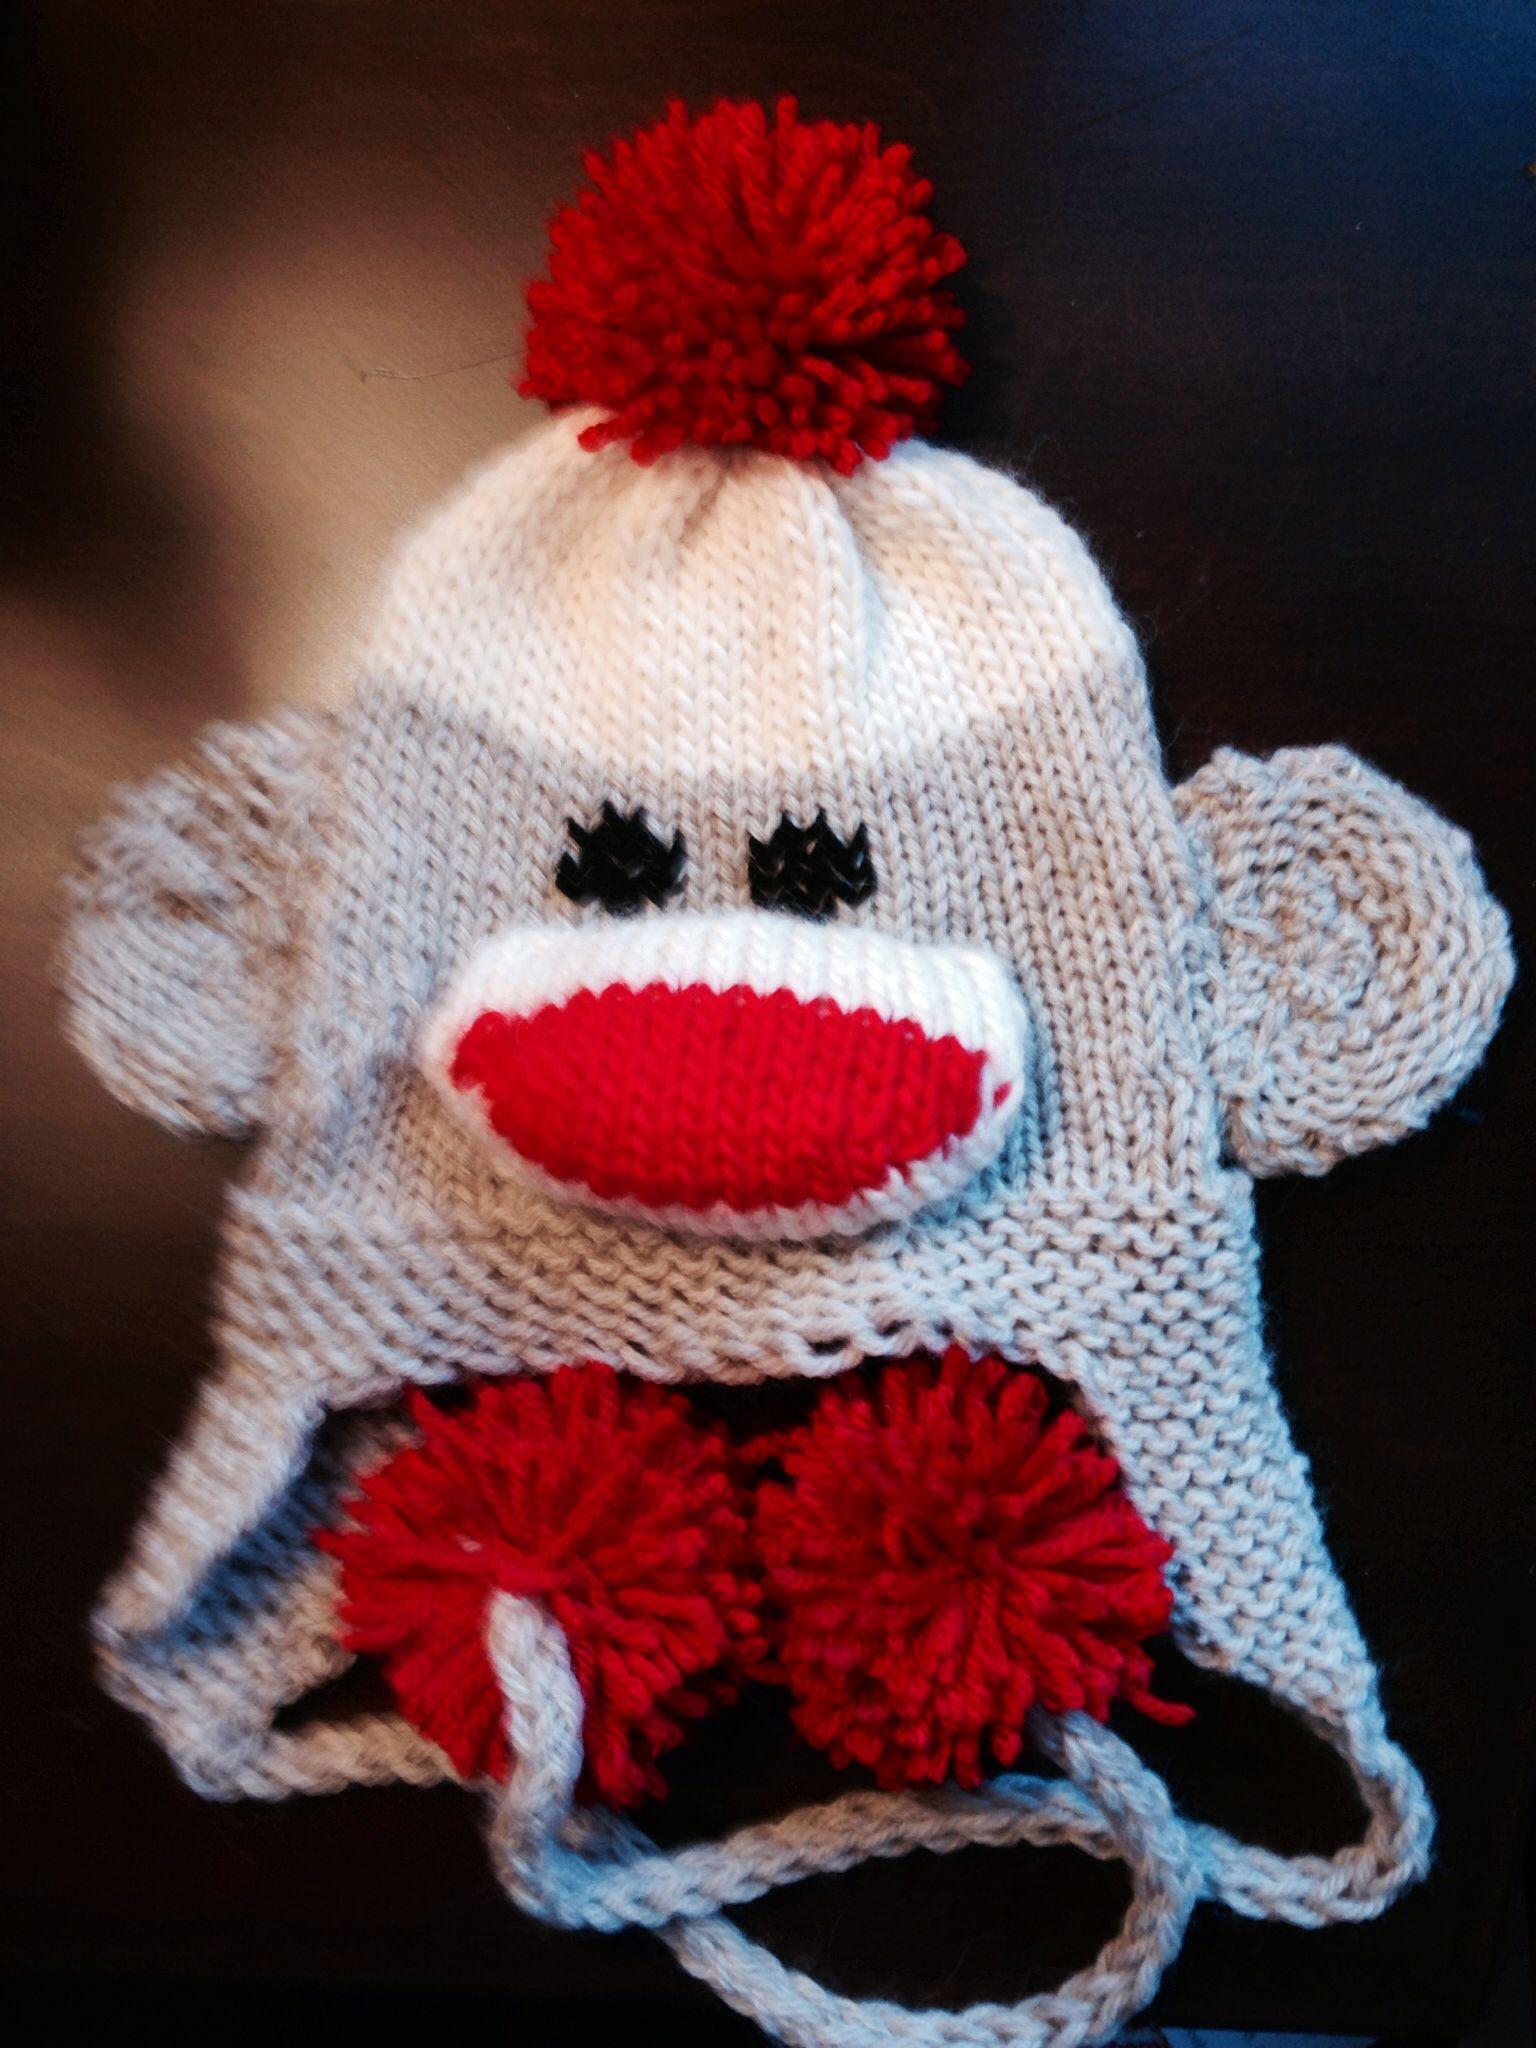 Loom knit sock monkey hat by kalicokat pattern by kathy norris loom knit sock monkey hat by kalicokat pattern by kathy norris bankloansurffo Images